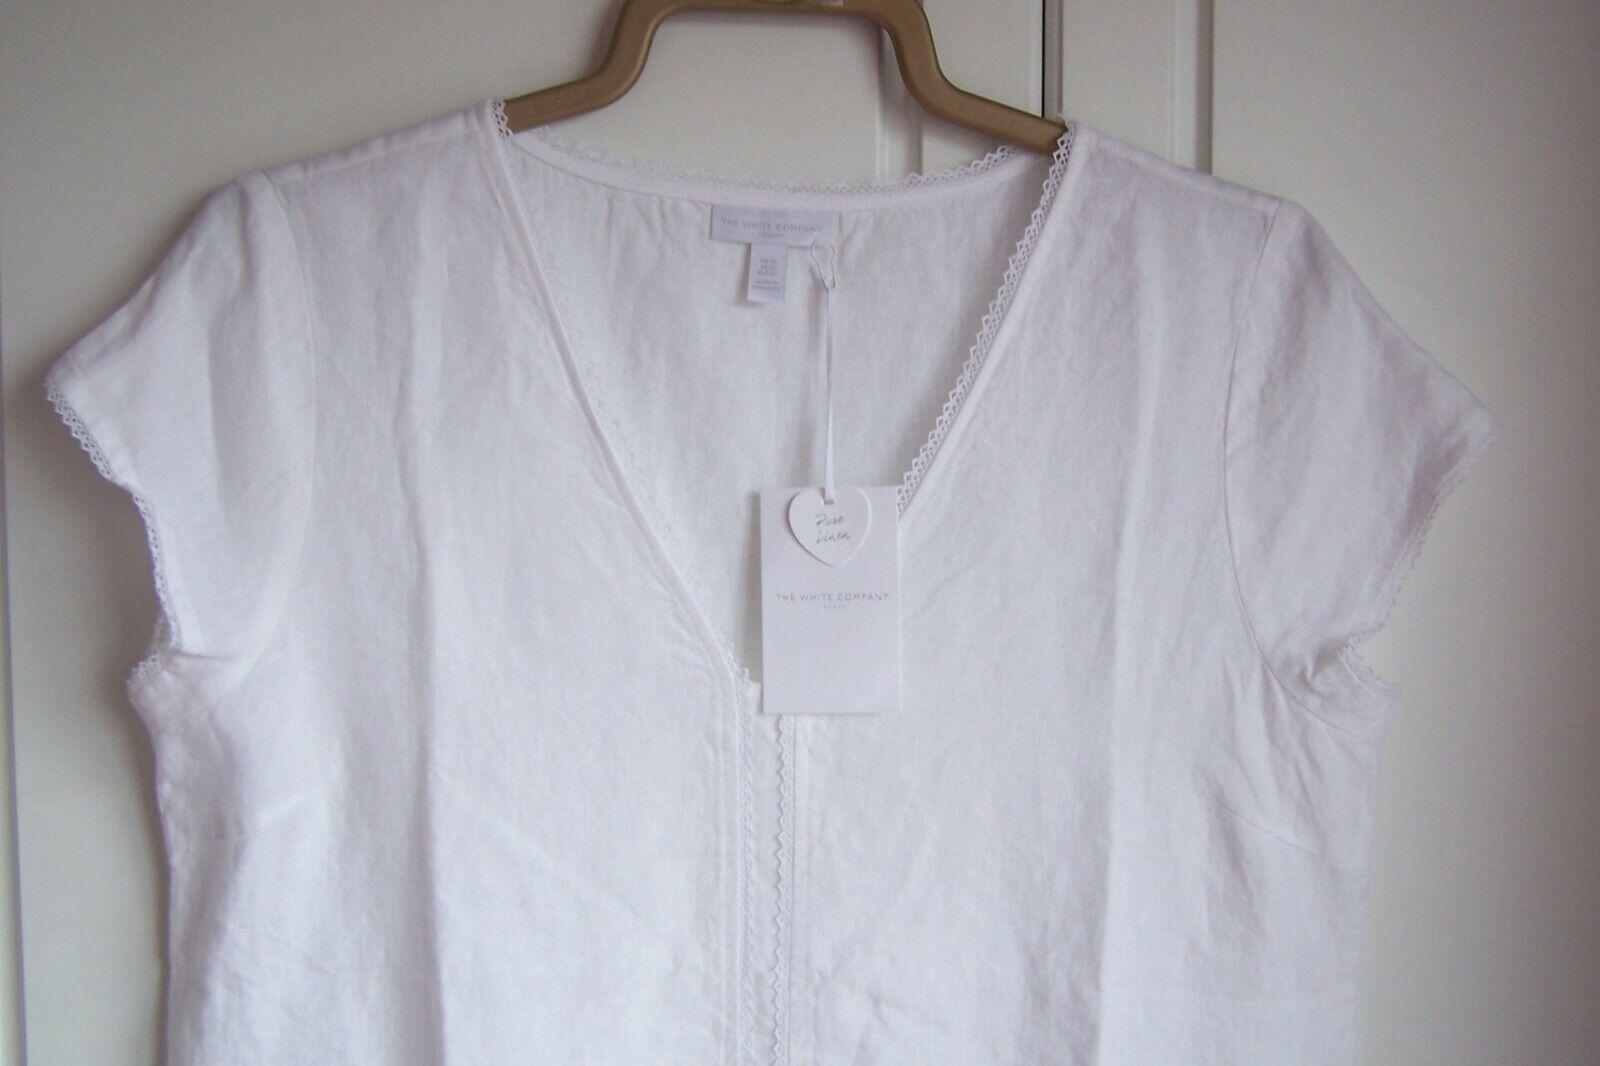 THE WHITE COMPANY 100% PURE LINEN KNEE LENGTH DRESS - SIZE 14 BNWT RRP